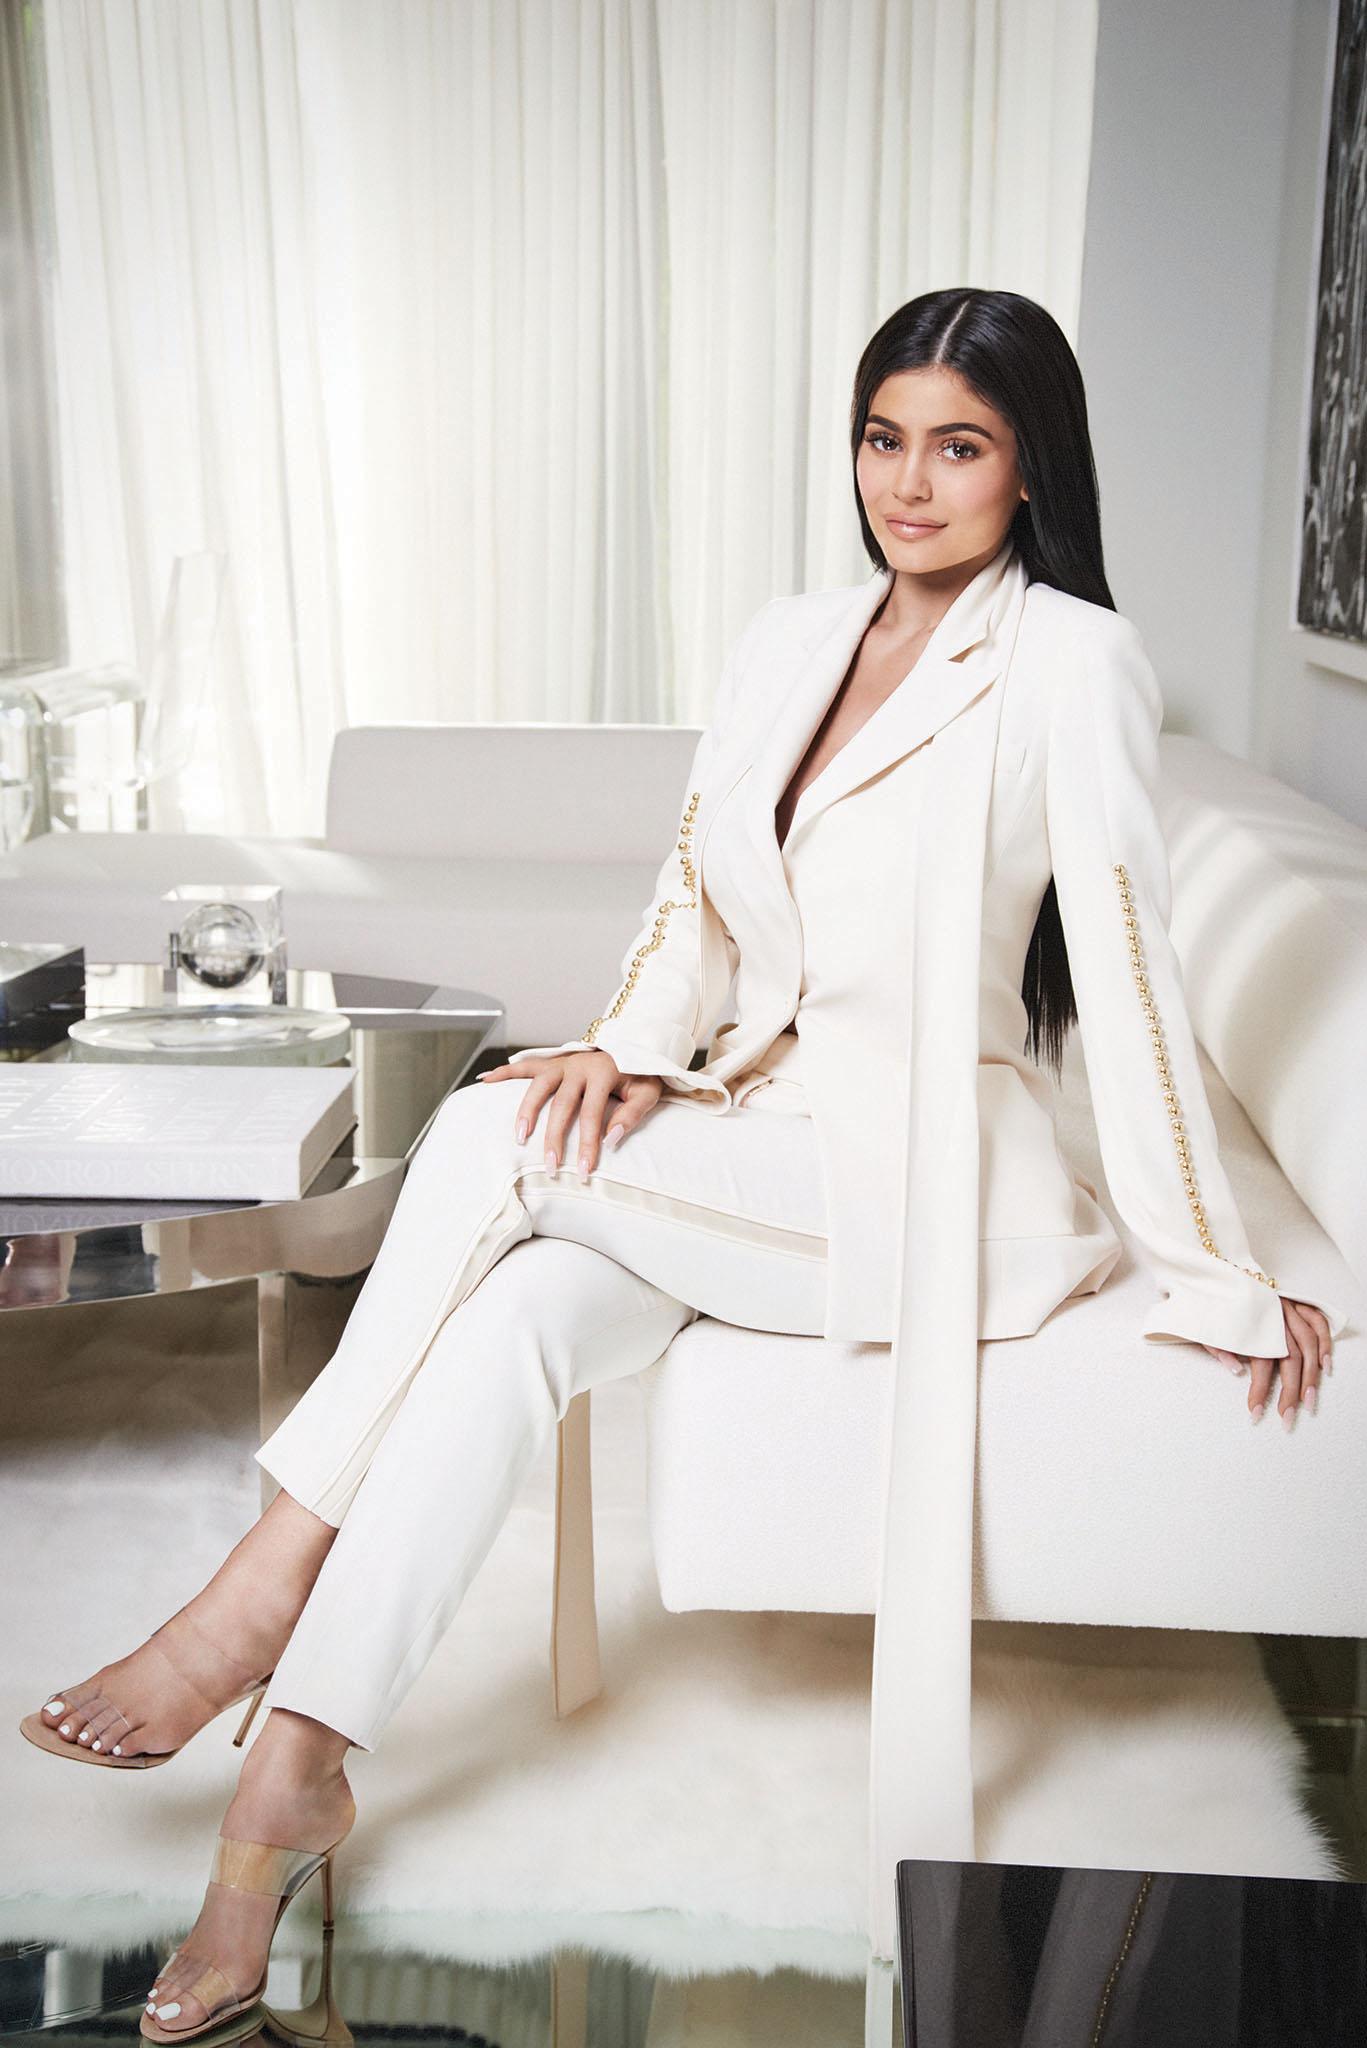 Kylie Jenner, 2017